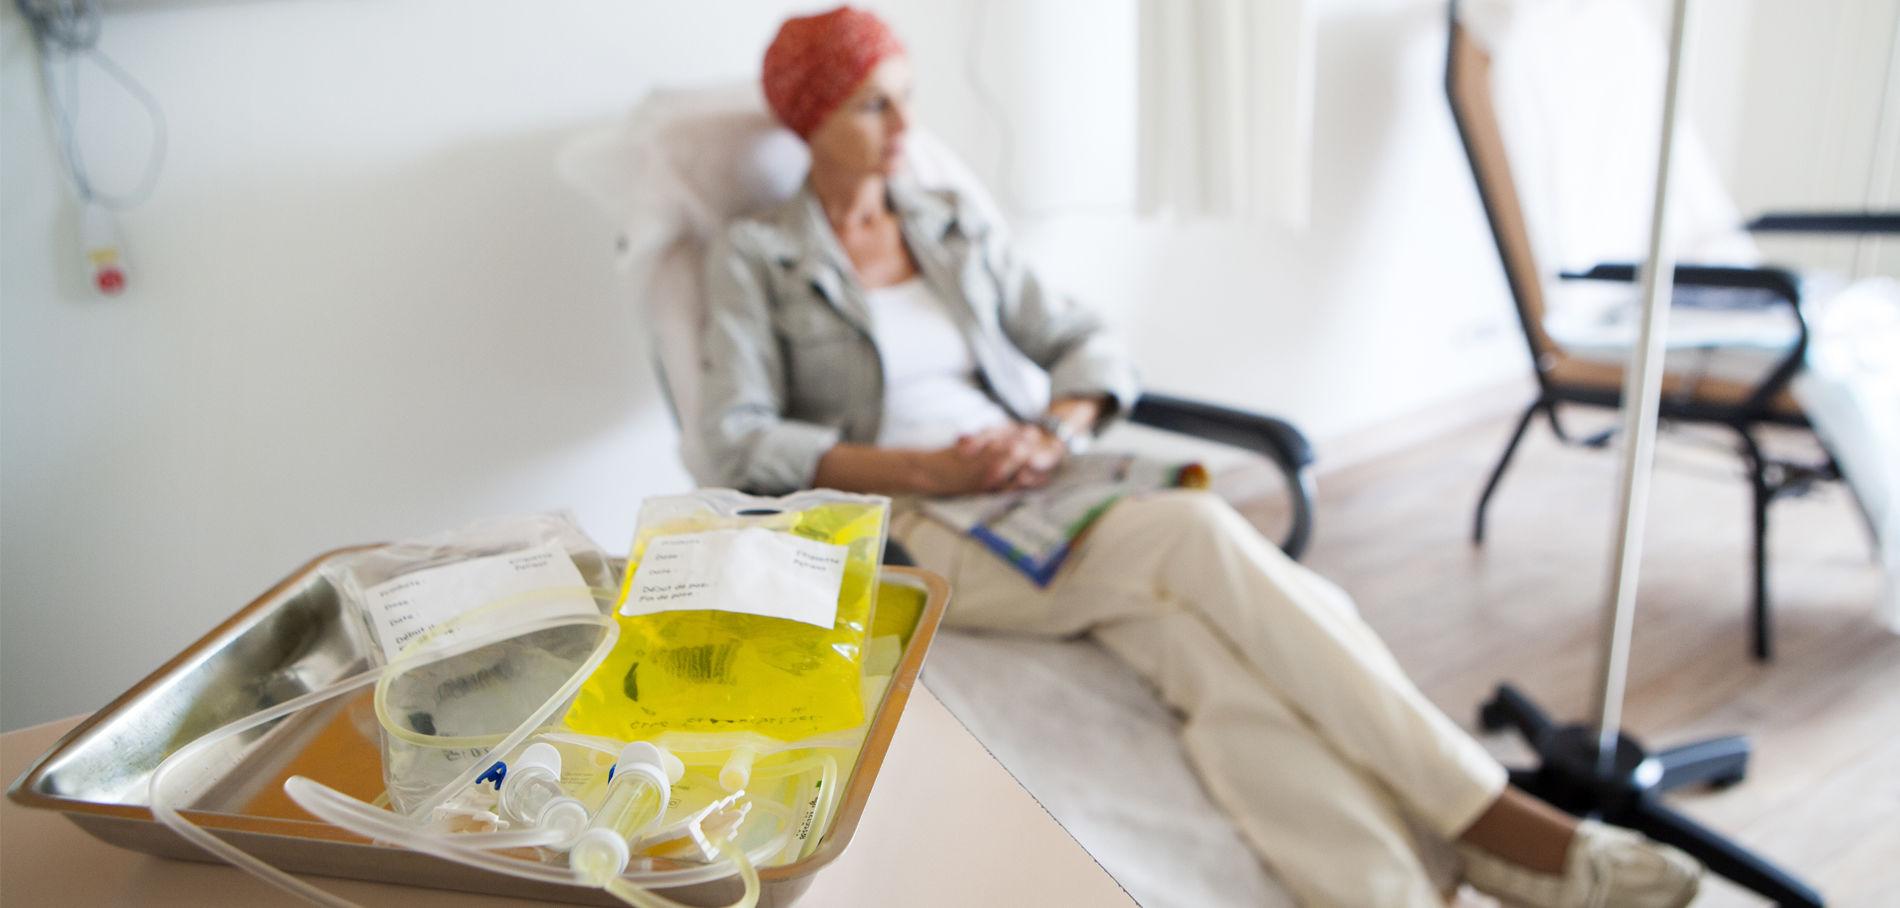 Chimiothérapie-cancer